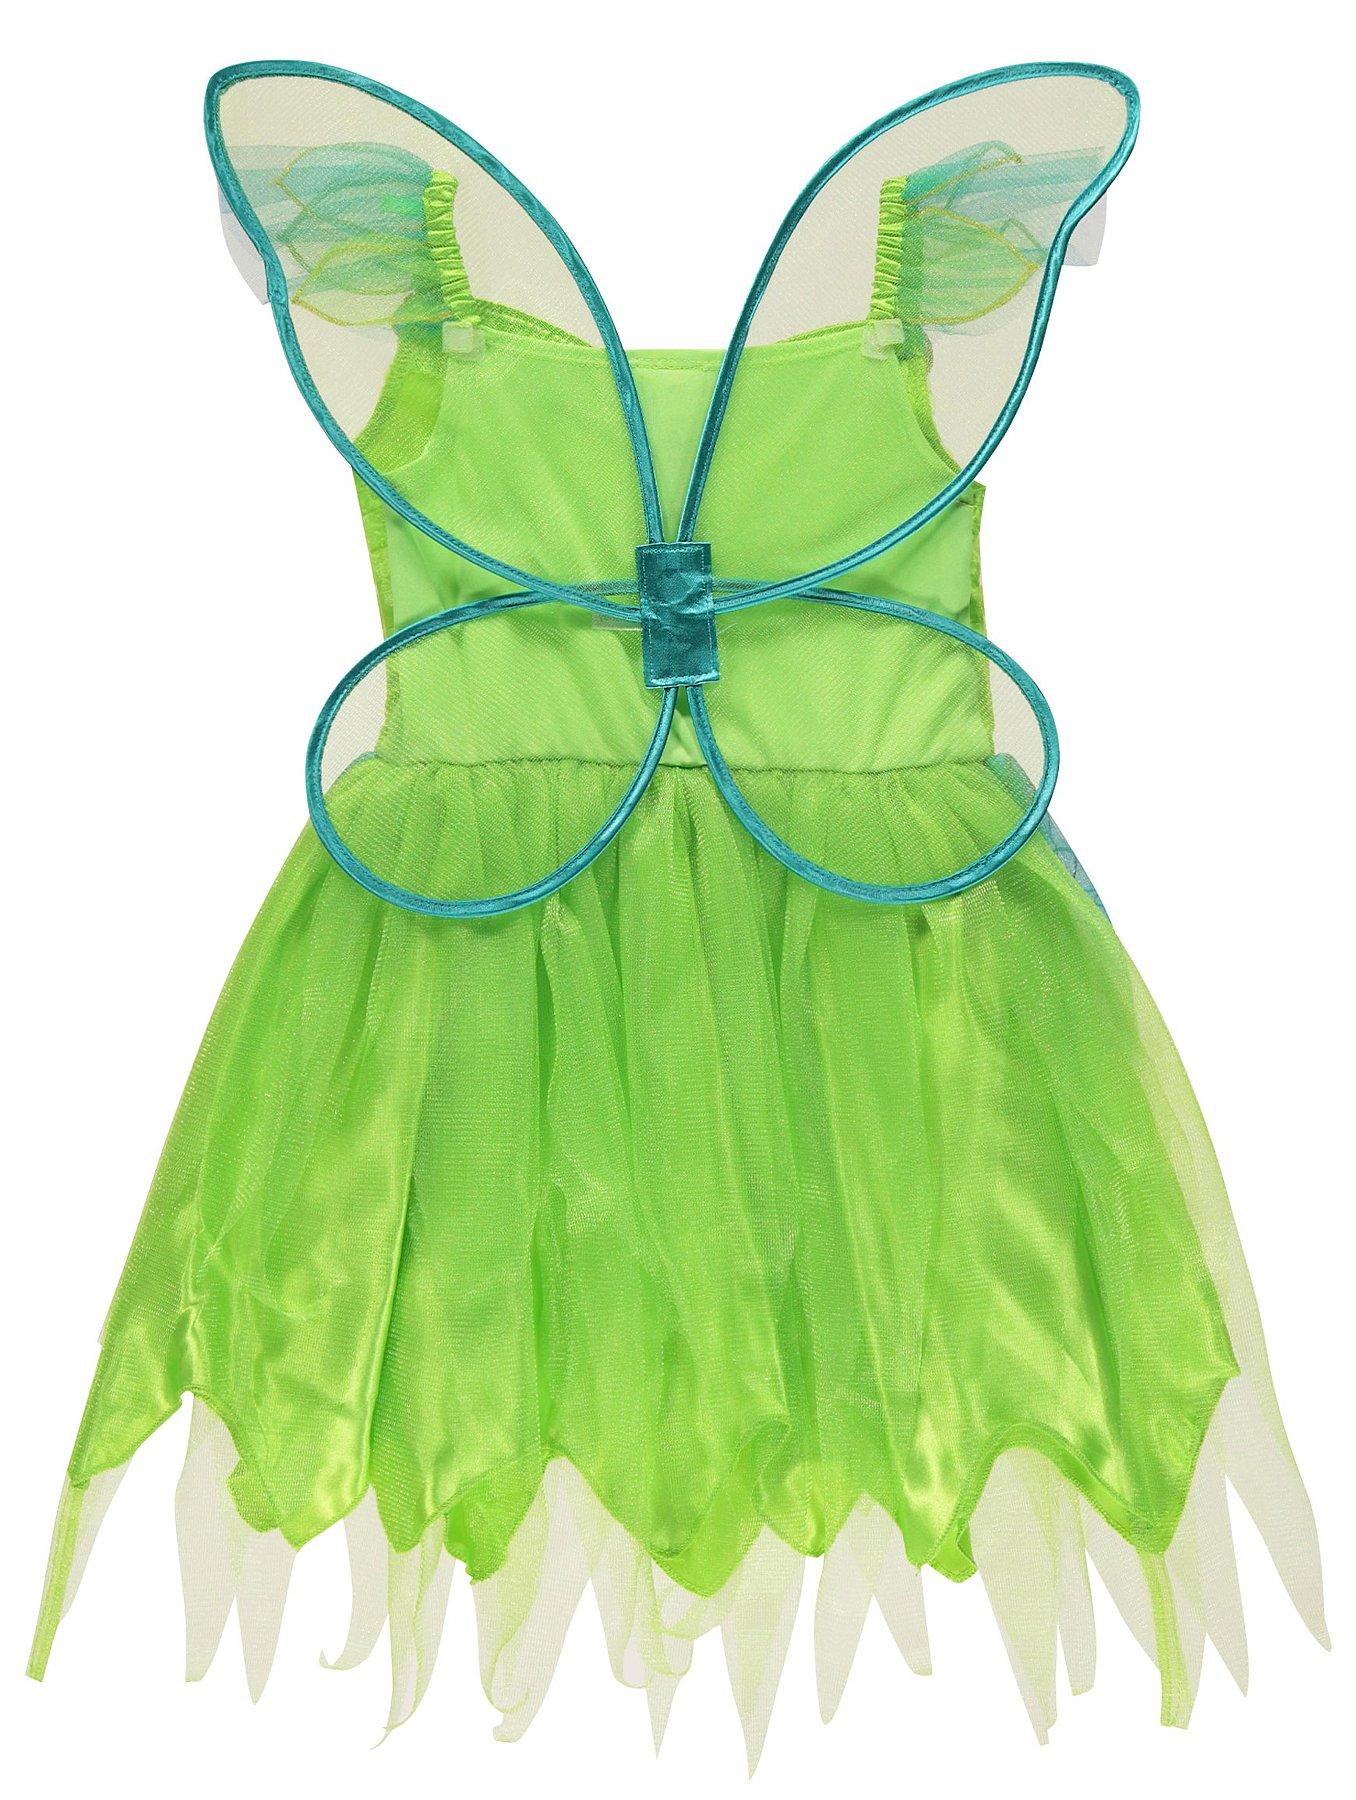 Disney Fairies Tinkerbell Fancy Dress Costume | Kids | George at ASDA